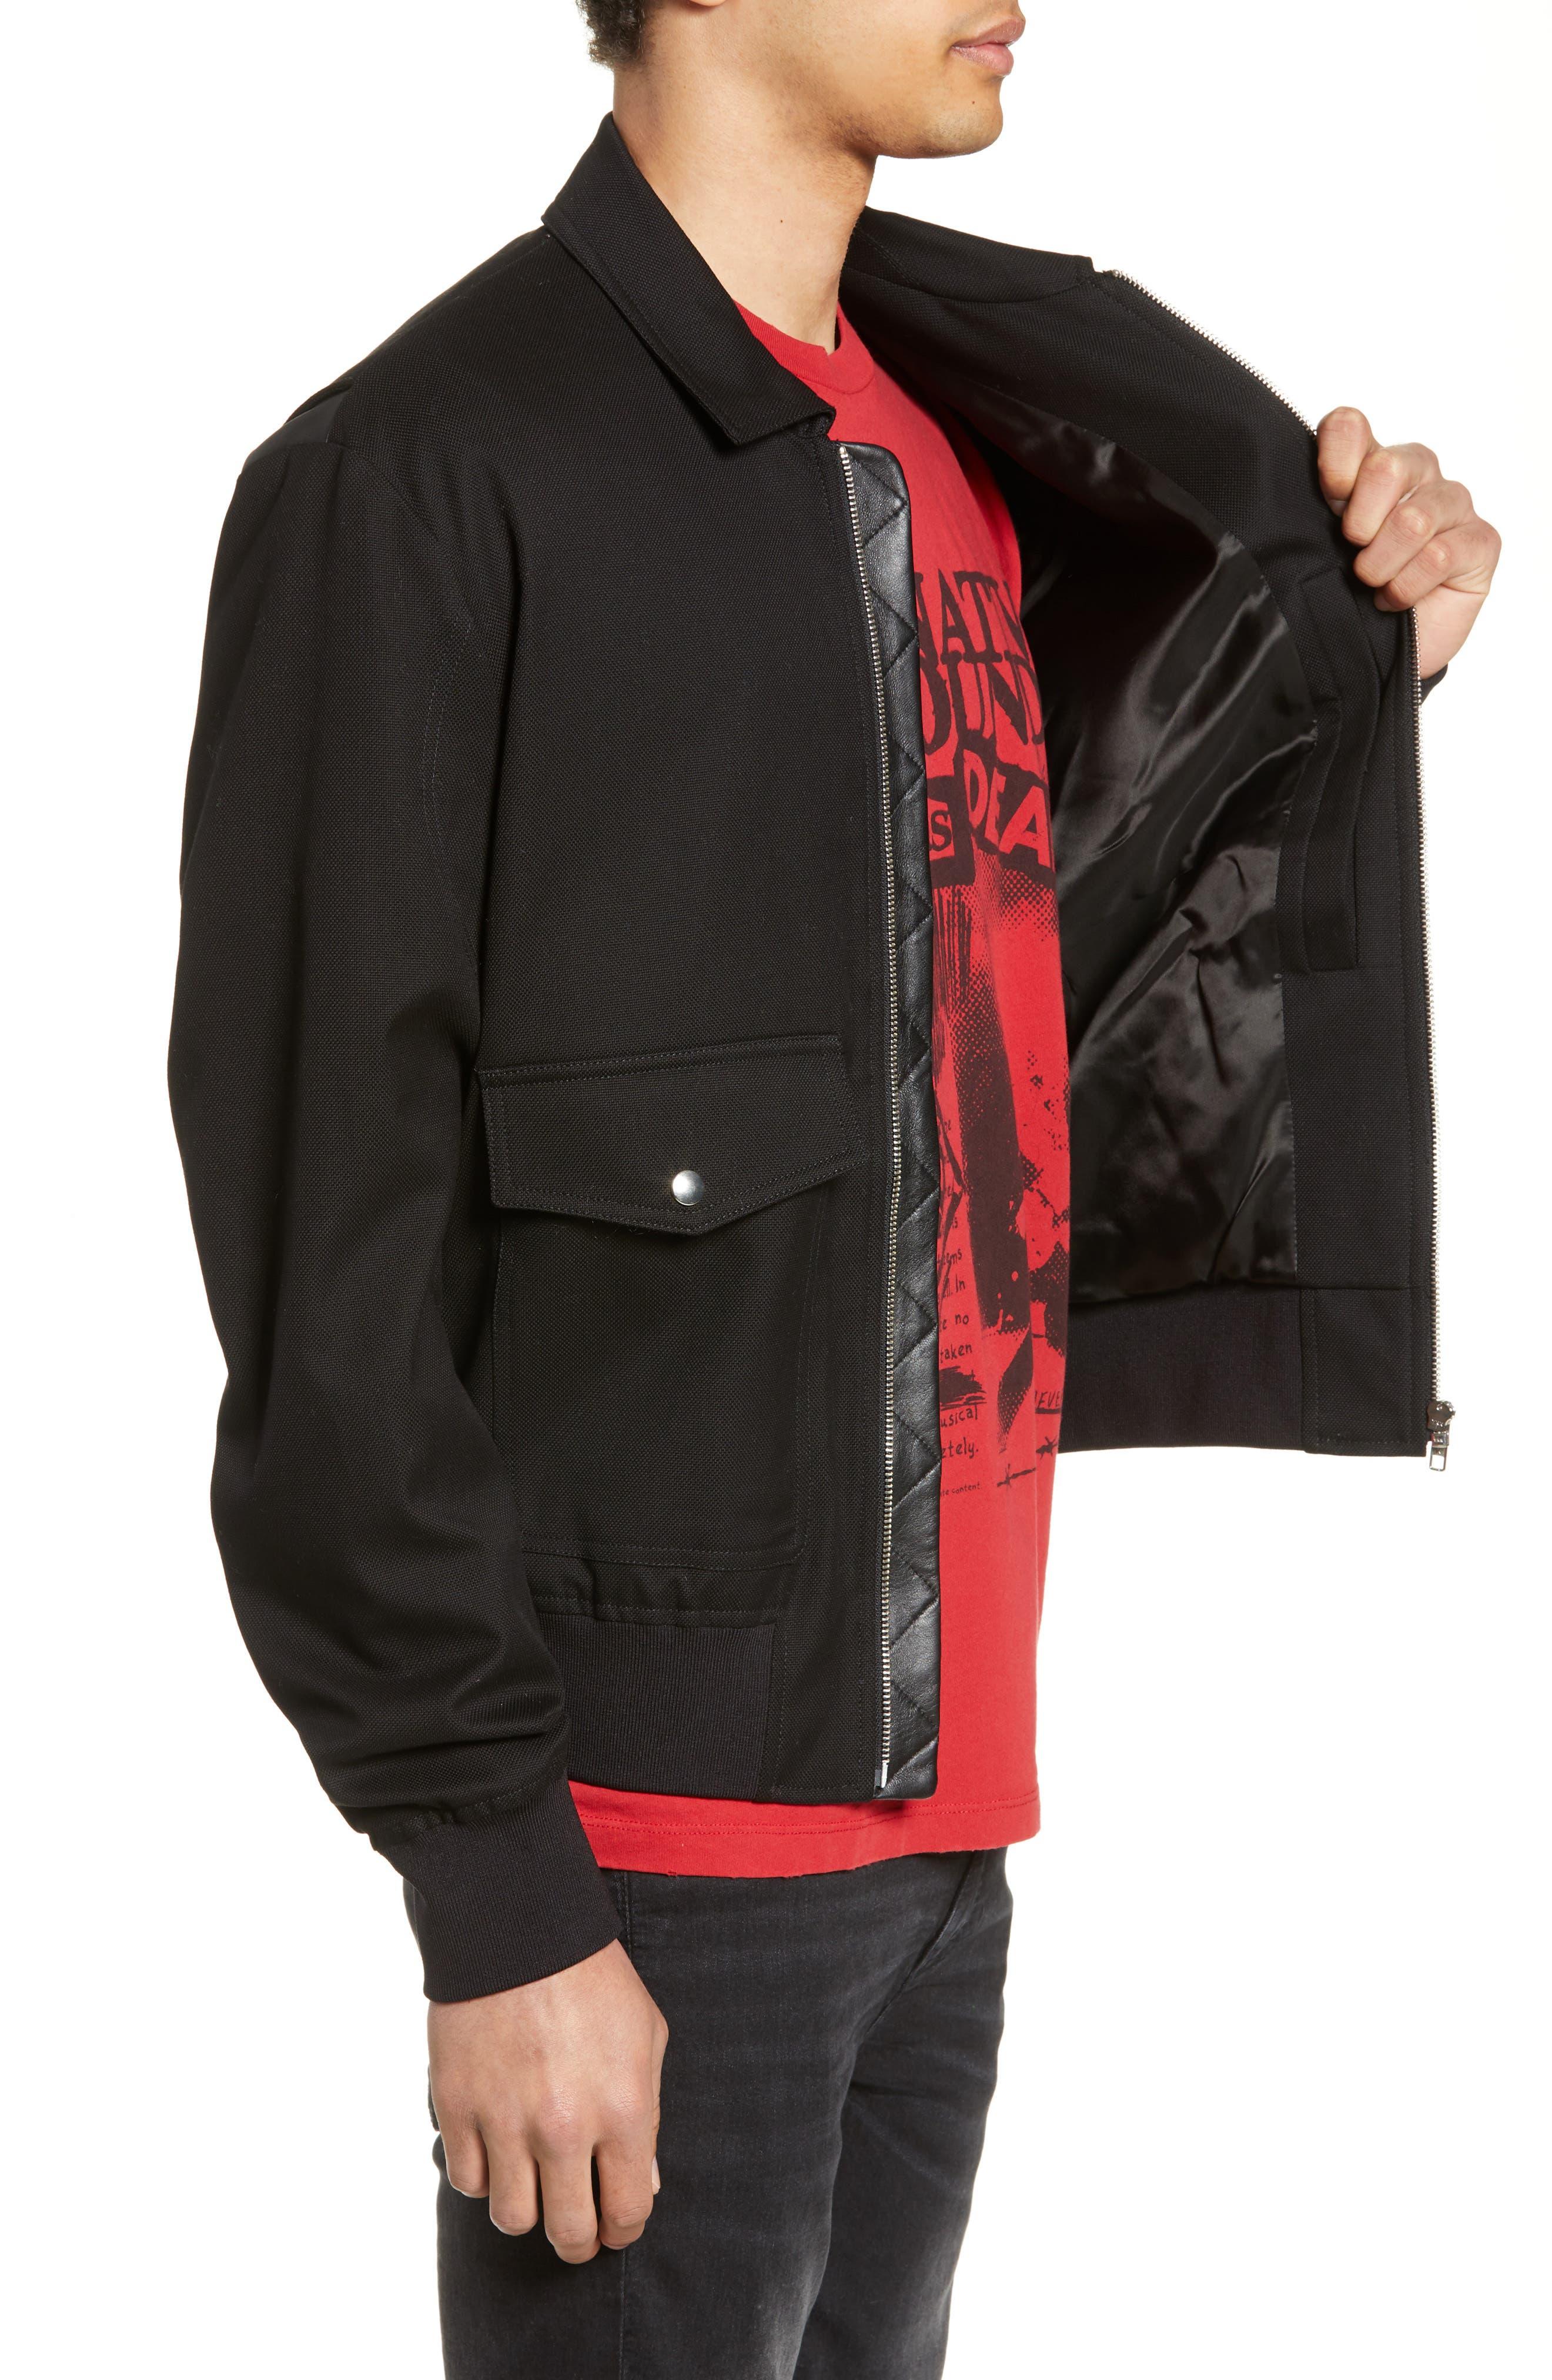 THE KOOPLES, Leather Detail Jacket, Alternate thumbnail 3, color, BLACK